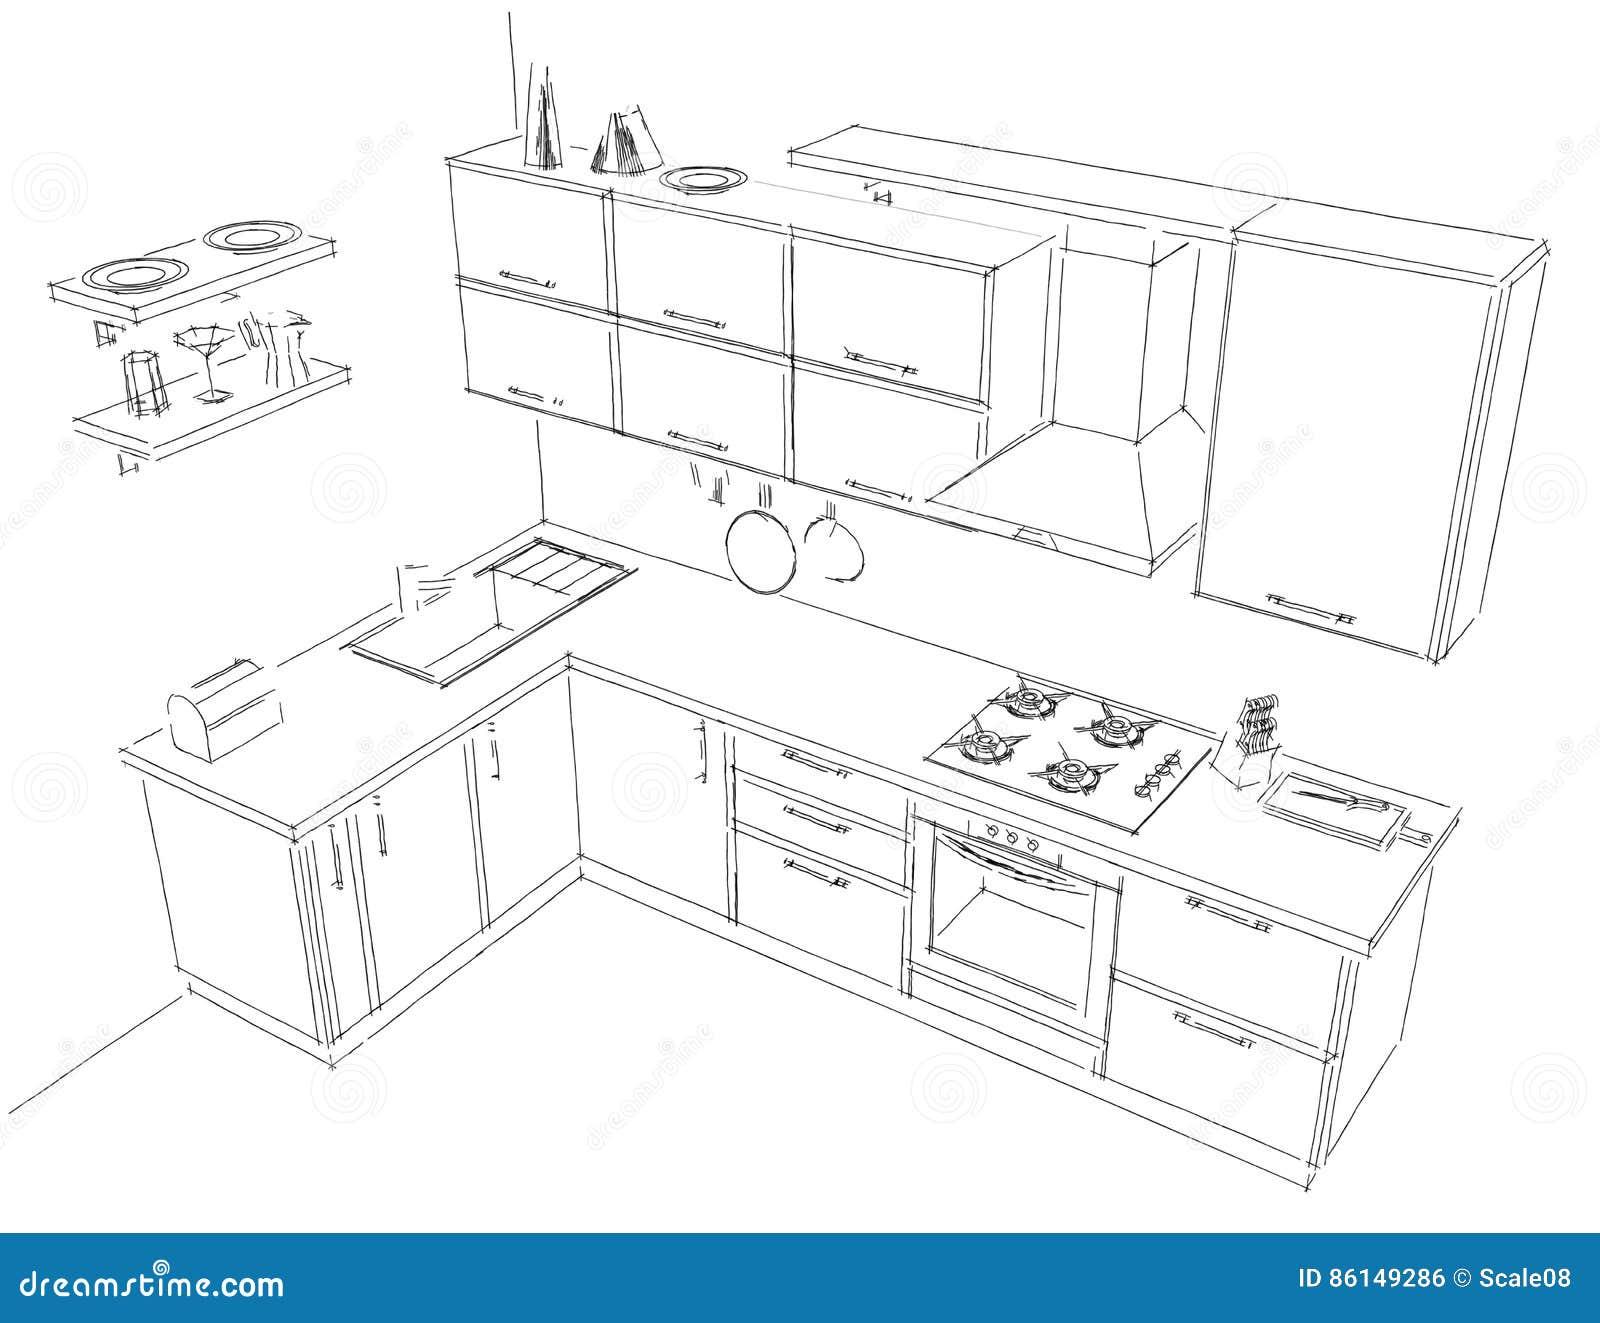 Dessiner cuisine 3d exceptional dessiner cuisine en d for Cuisine dessin 3d